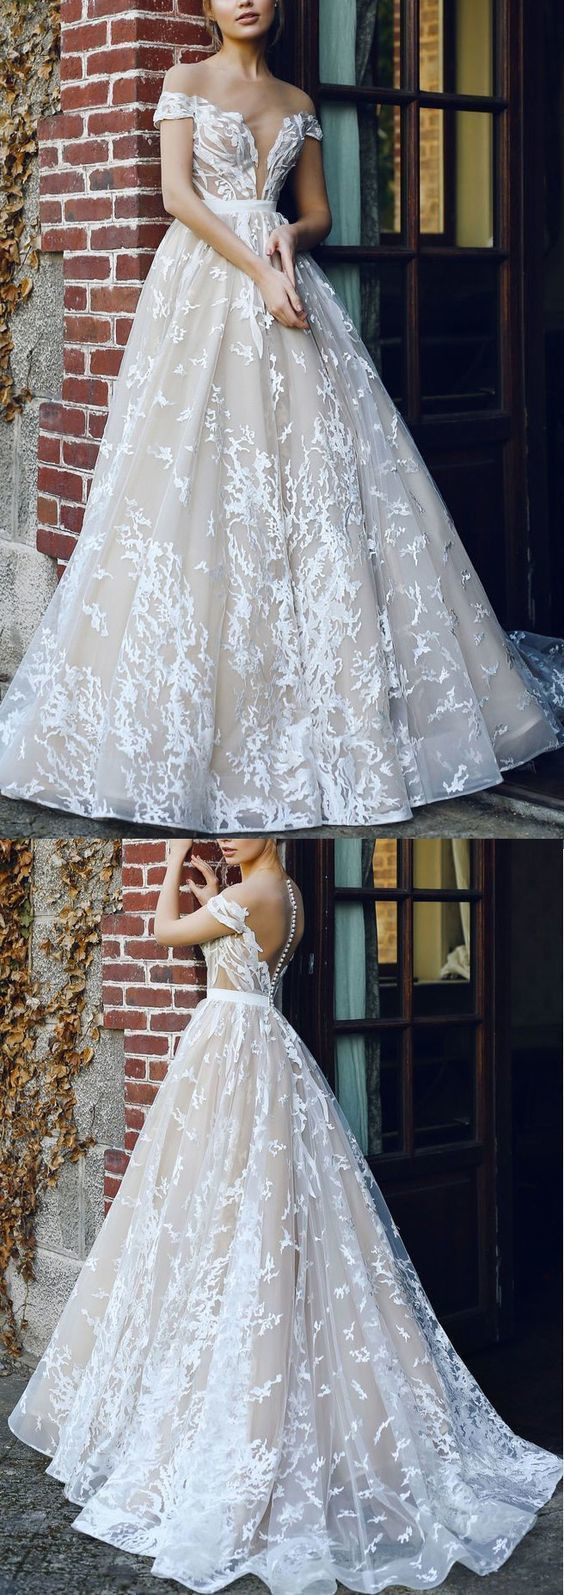 Discount Sleeveless Dresses Long Ivory Wedding Dresses With Applique Zipper